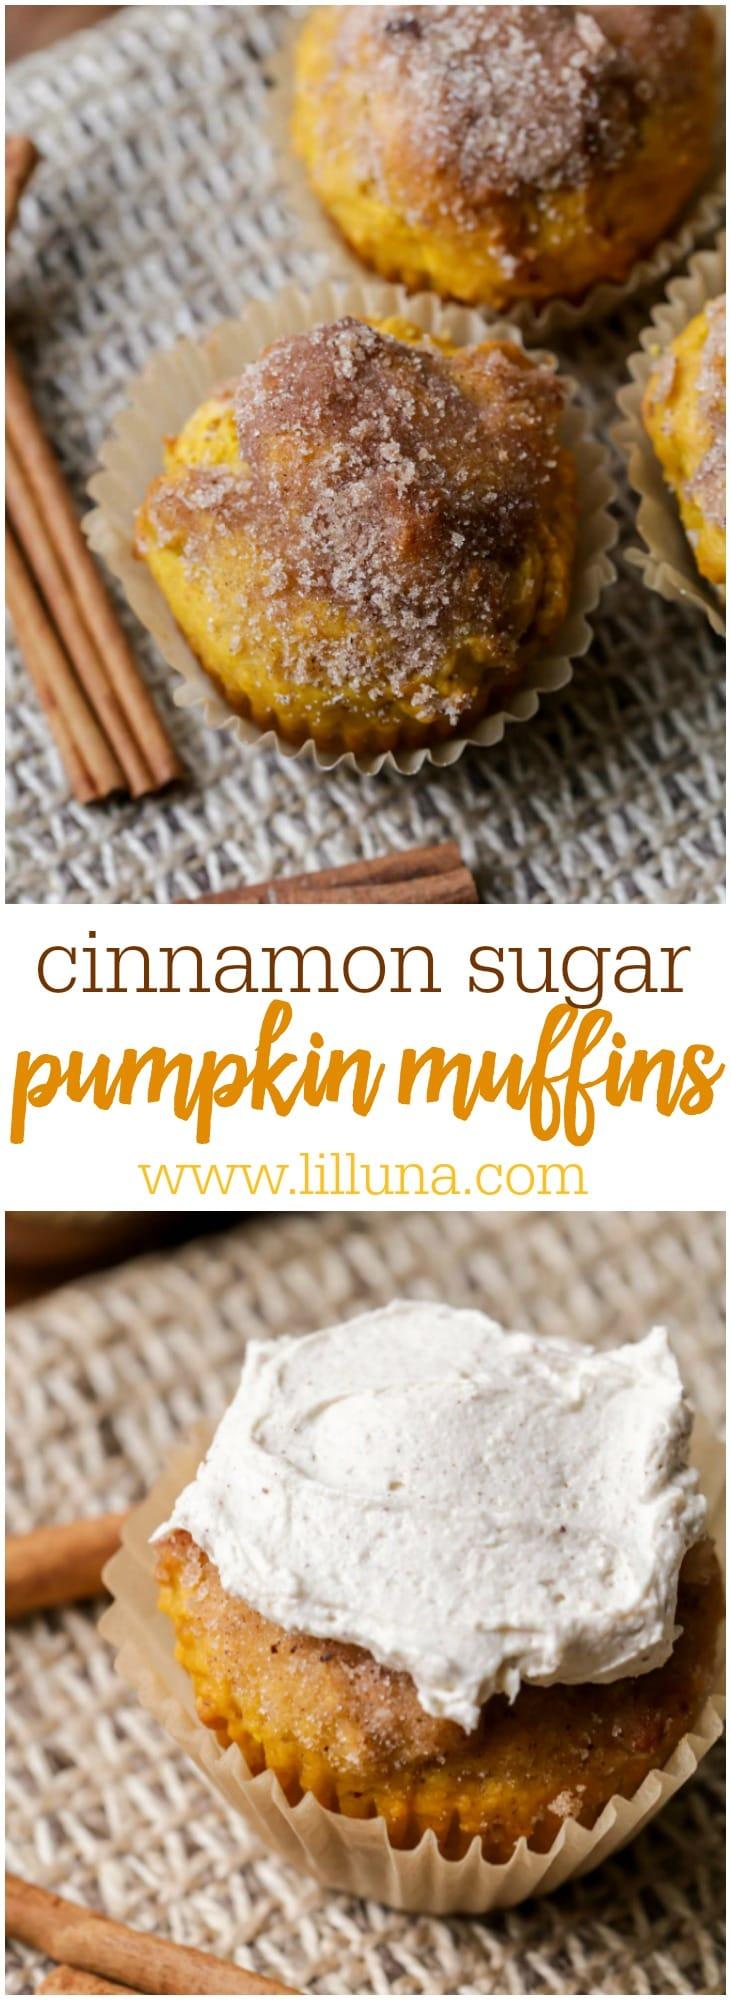 Cinnamon Sugar Pumpkin Muffins recipe. So moist and full of cinnamon, sugar, and pumpkin with a cinnamon butter cream cheese spread!